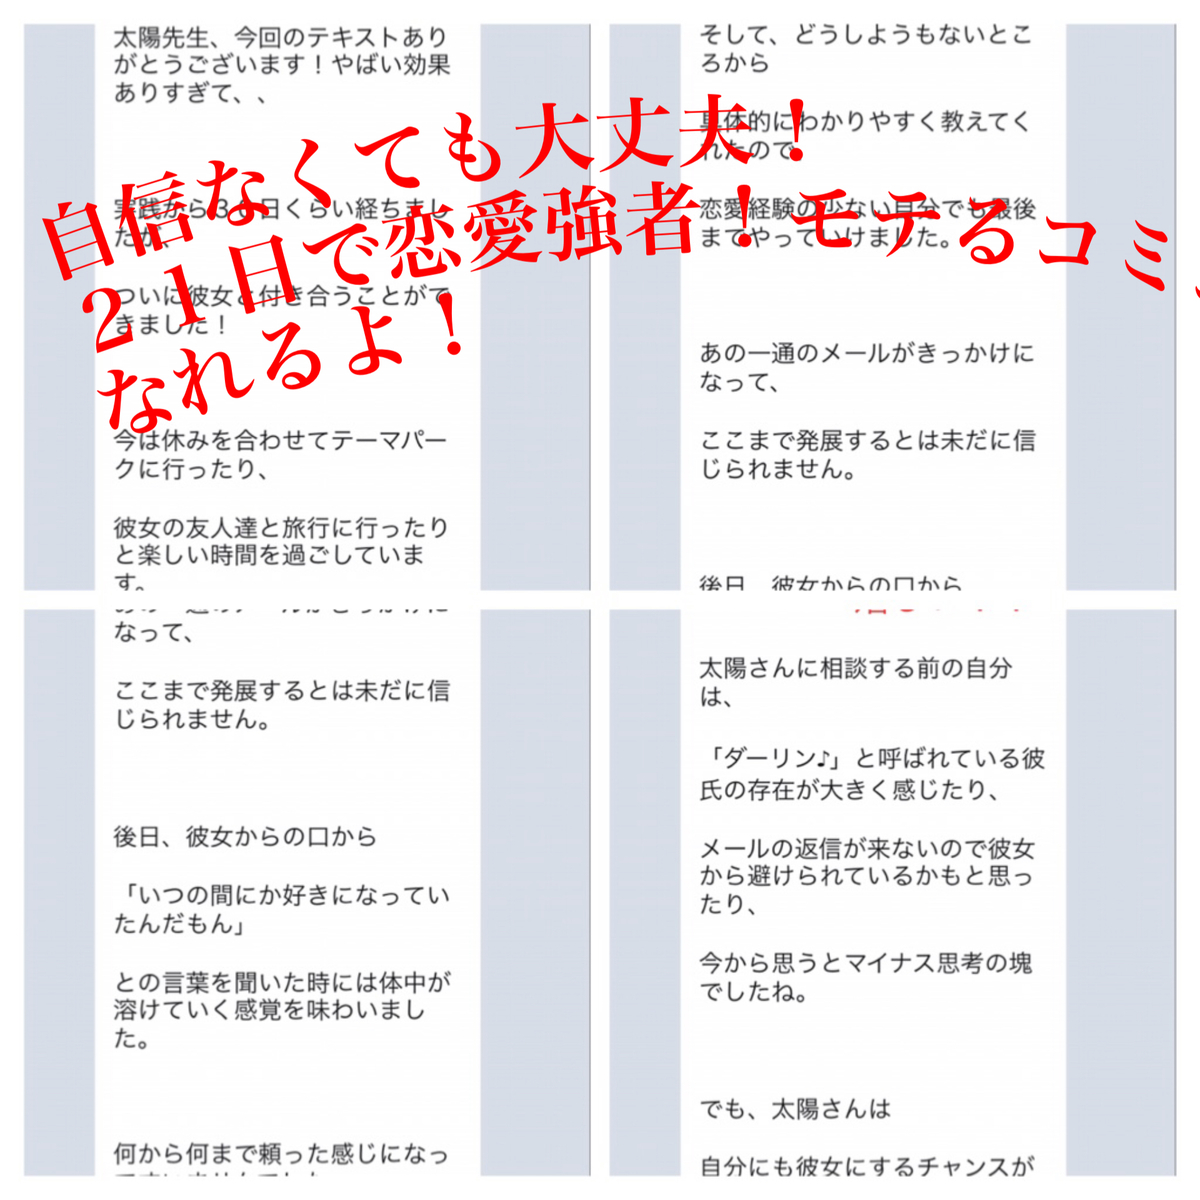 f:id:renaisukidesu:20191029183845j:plain